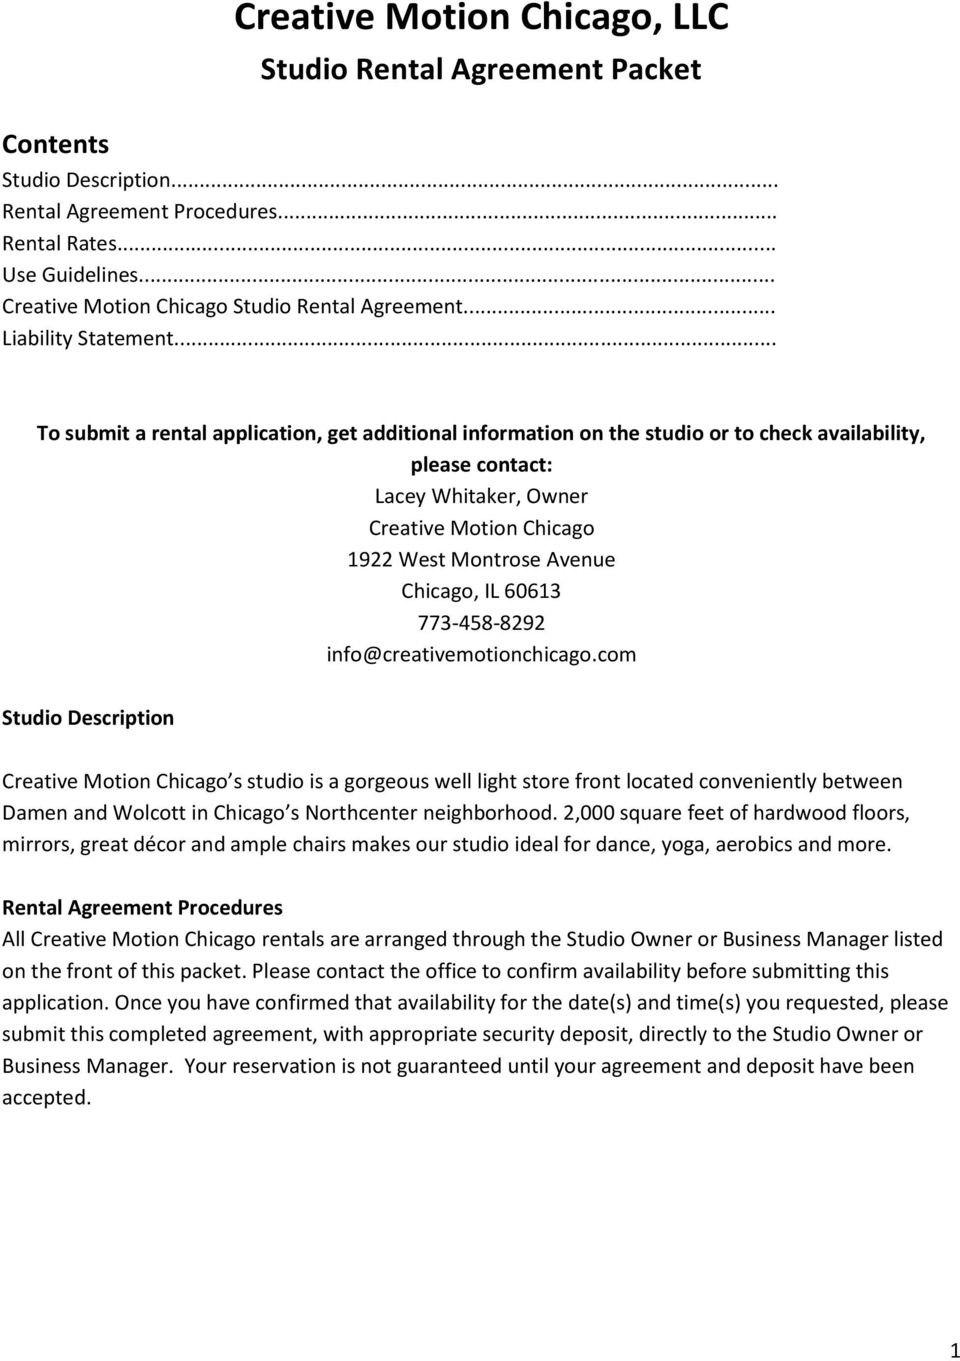 Creative Motion Chicago Llc  Pdf Regarding Dance Studio Rental Agreement Template